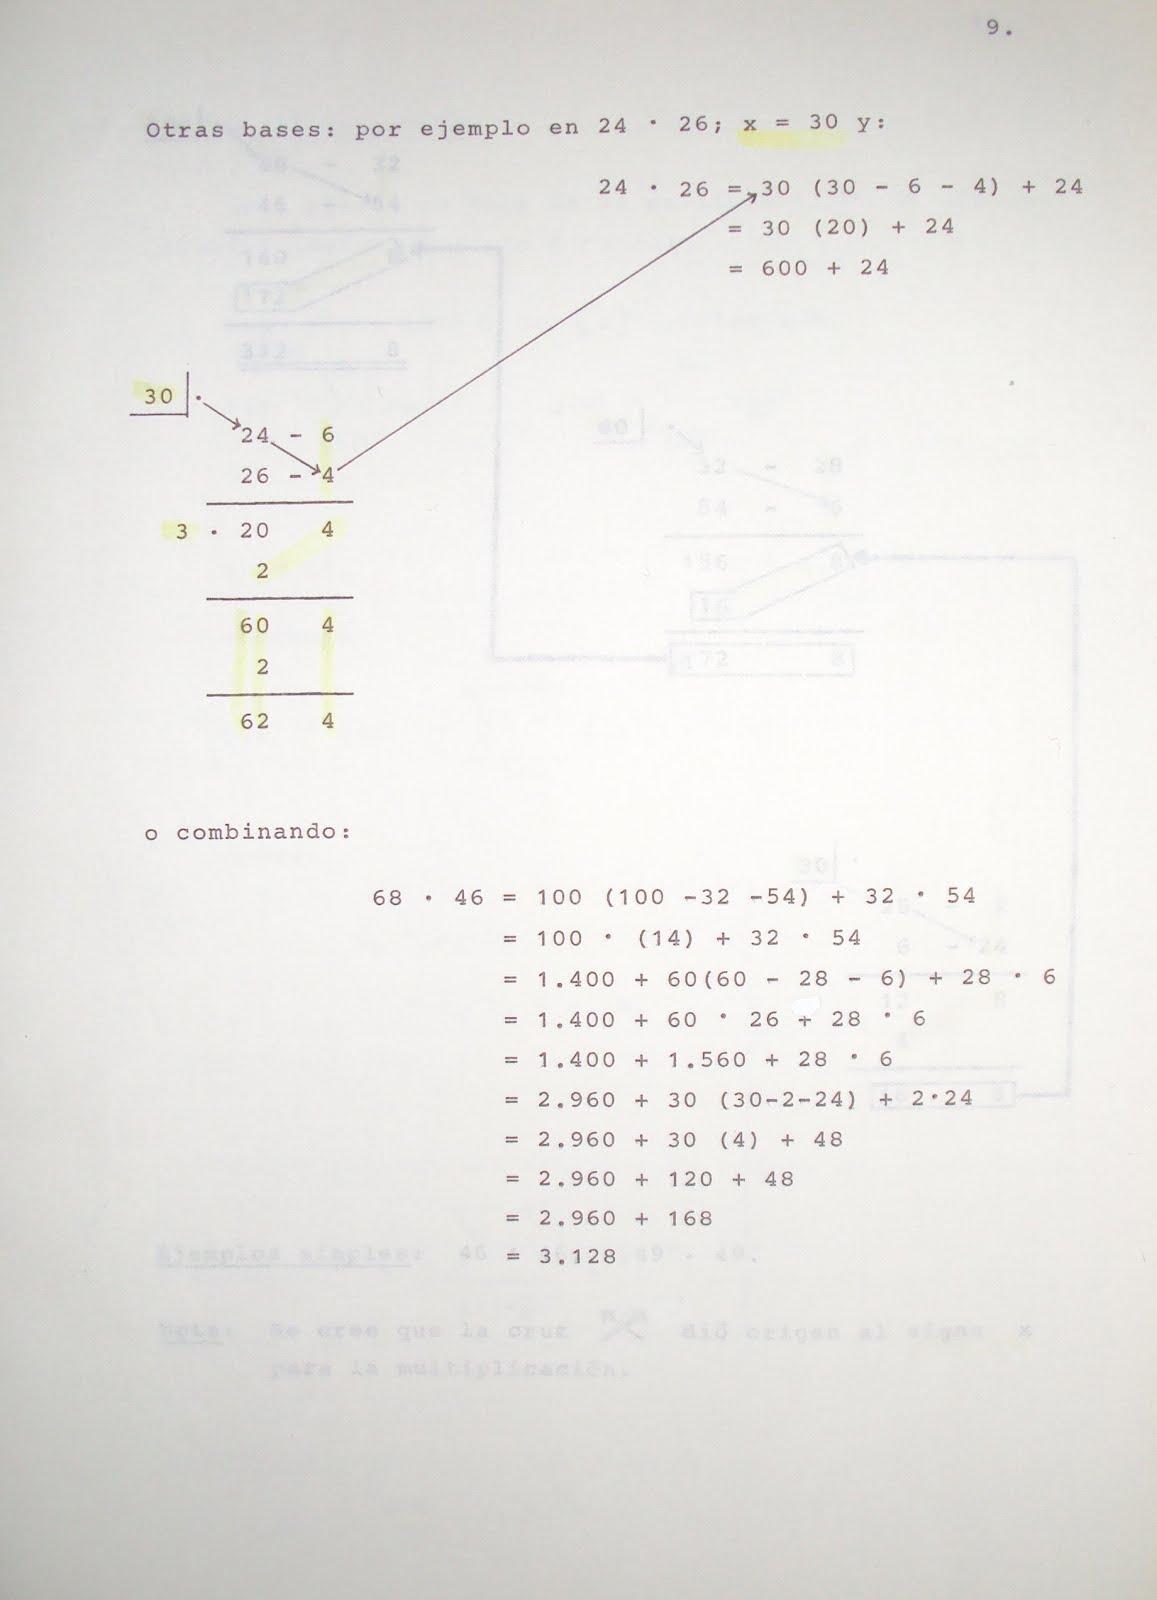 pag11.JPG